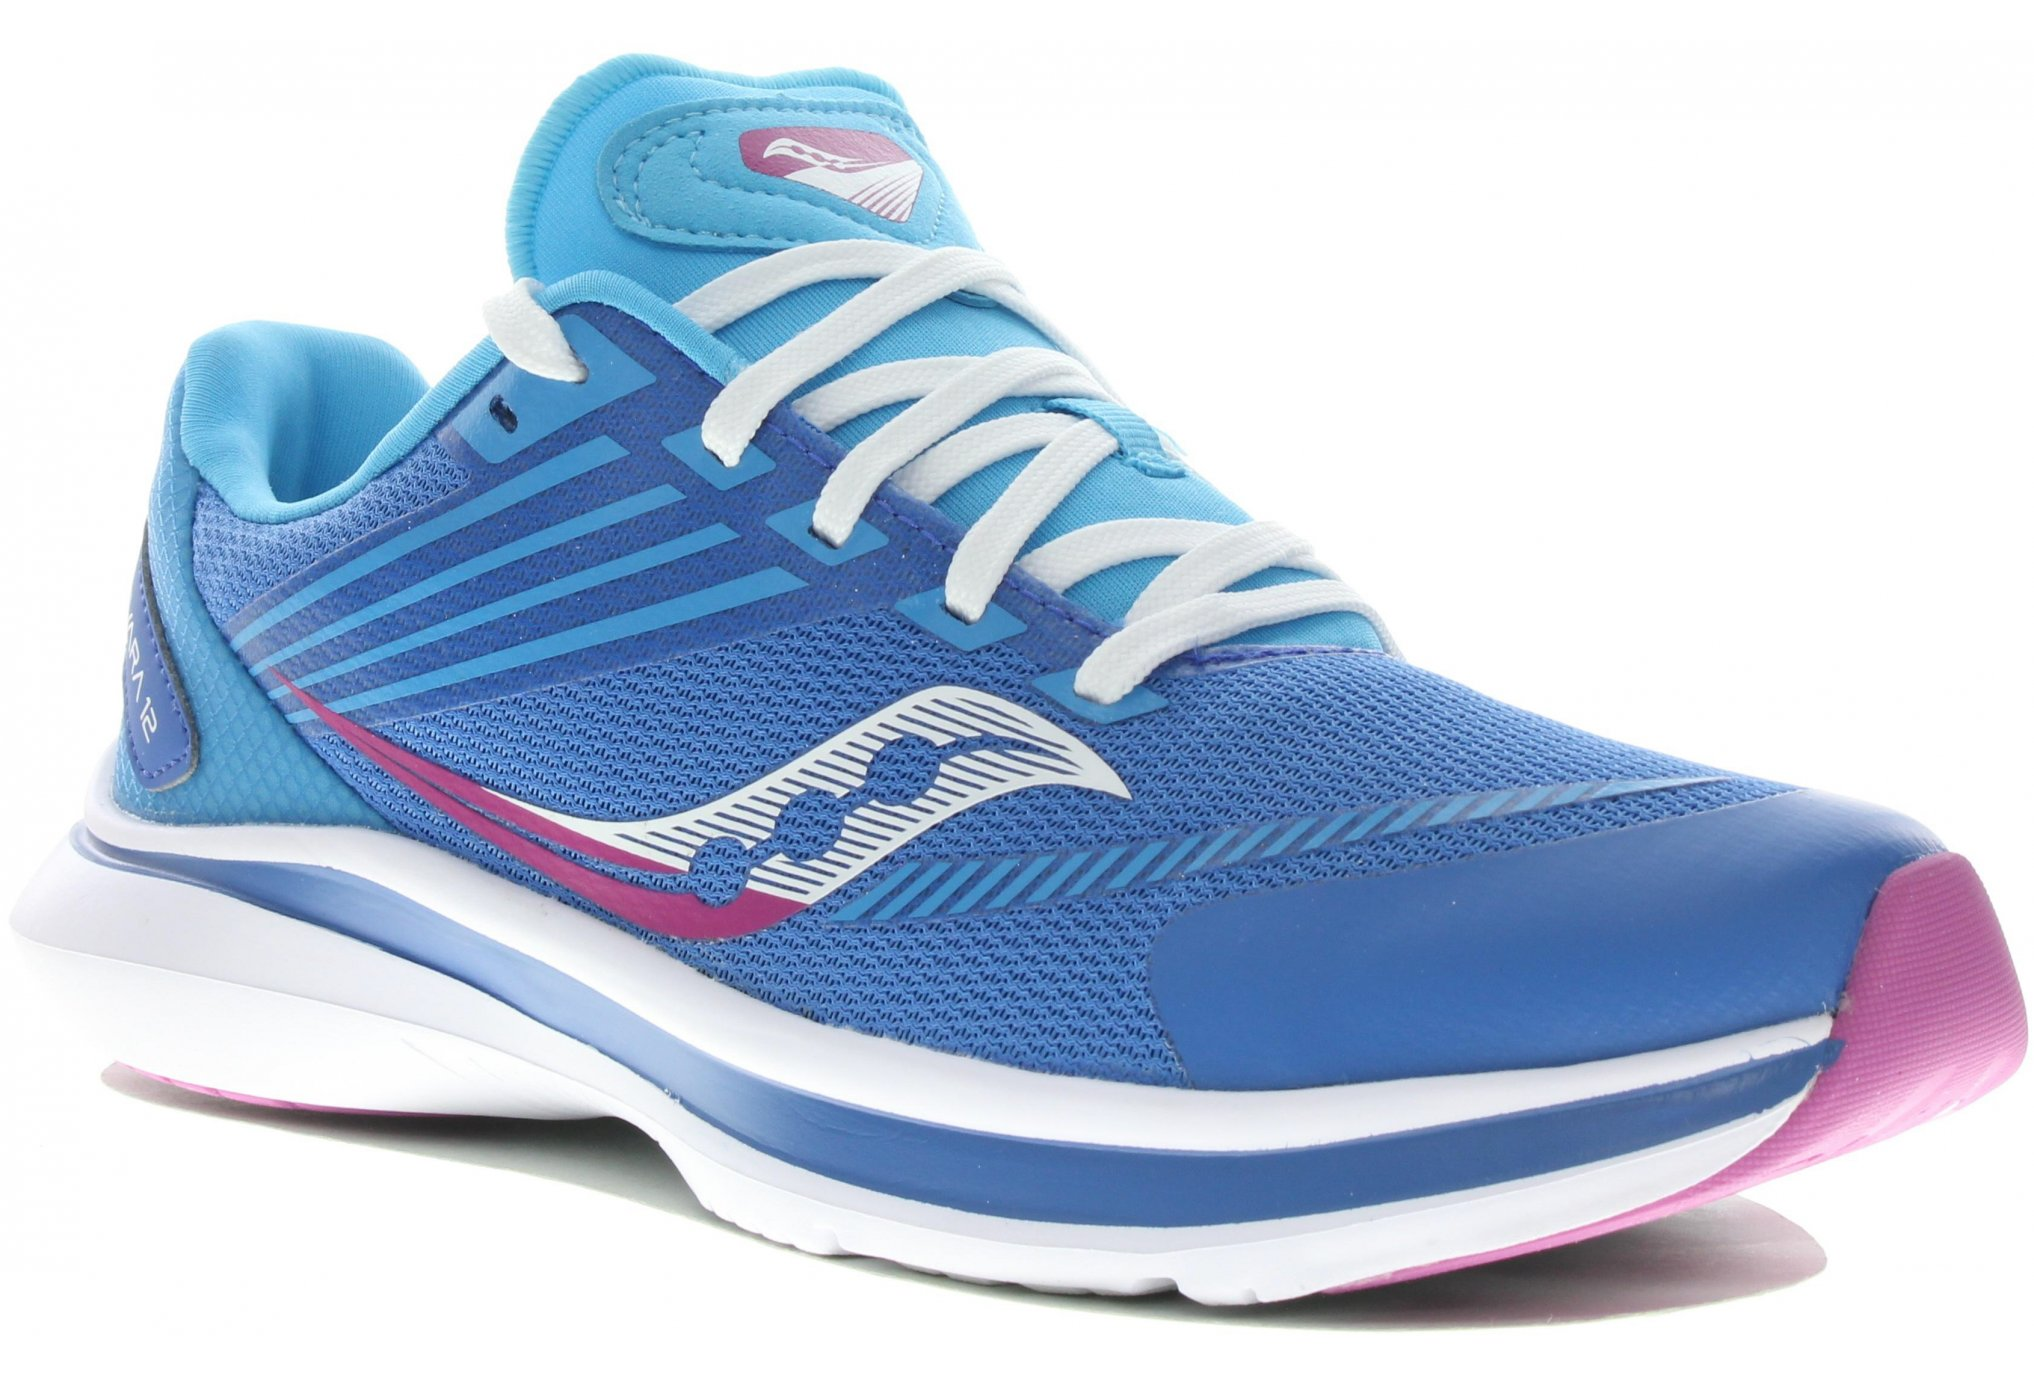 Saucony Kinvara 12 Fille Chaussures running femme